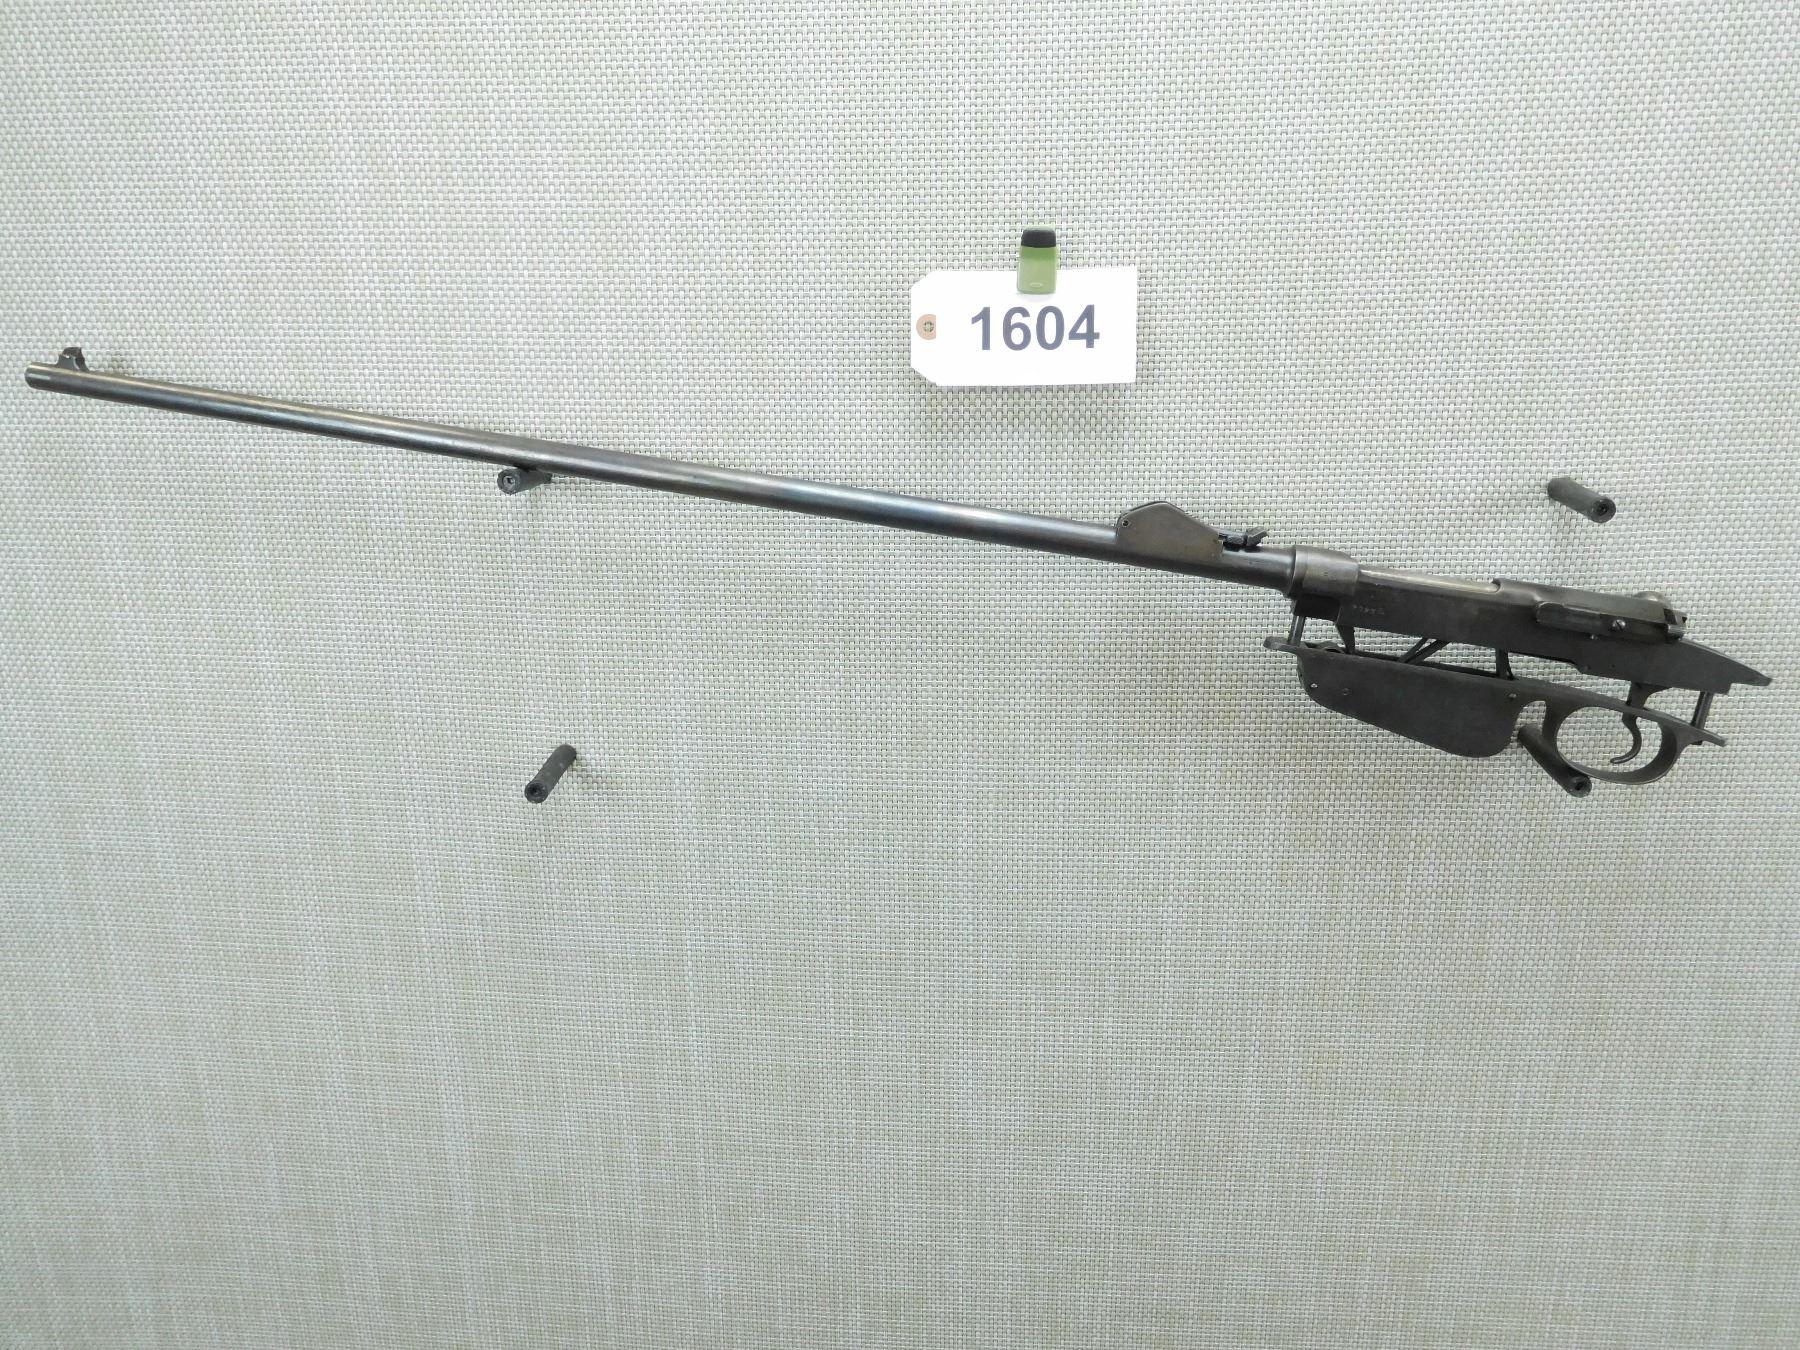 STEYR MANNLICHER, MODEL: 1886 AUSTRIAN RIFLE , CALIBER: 8 X 50R